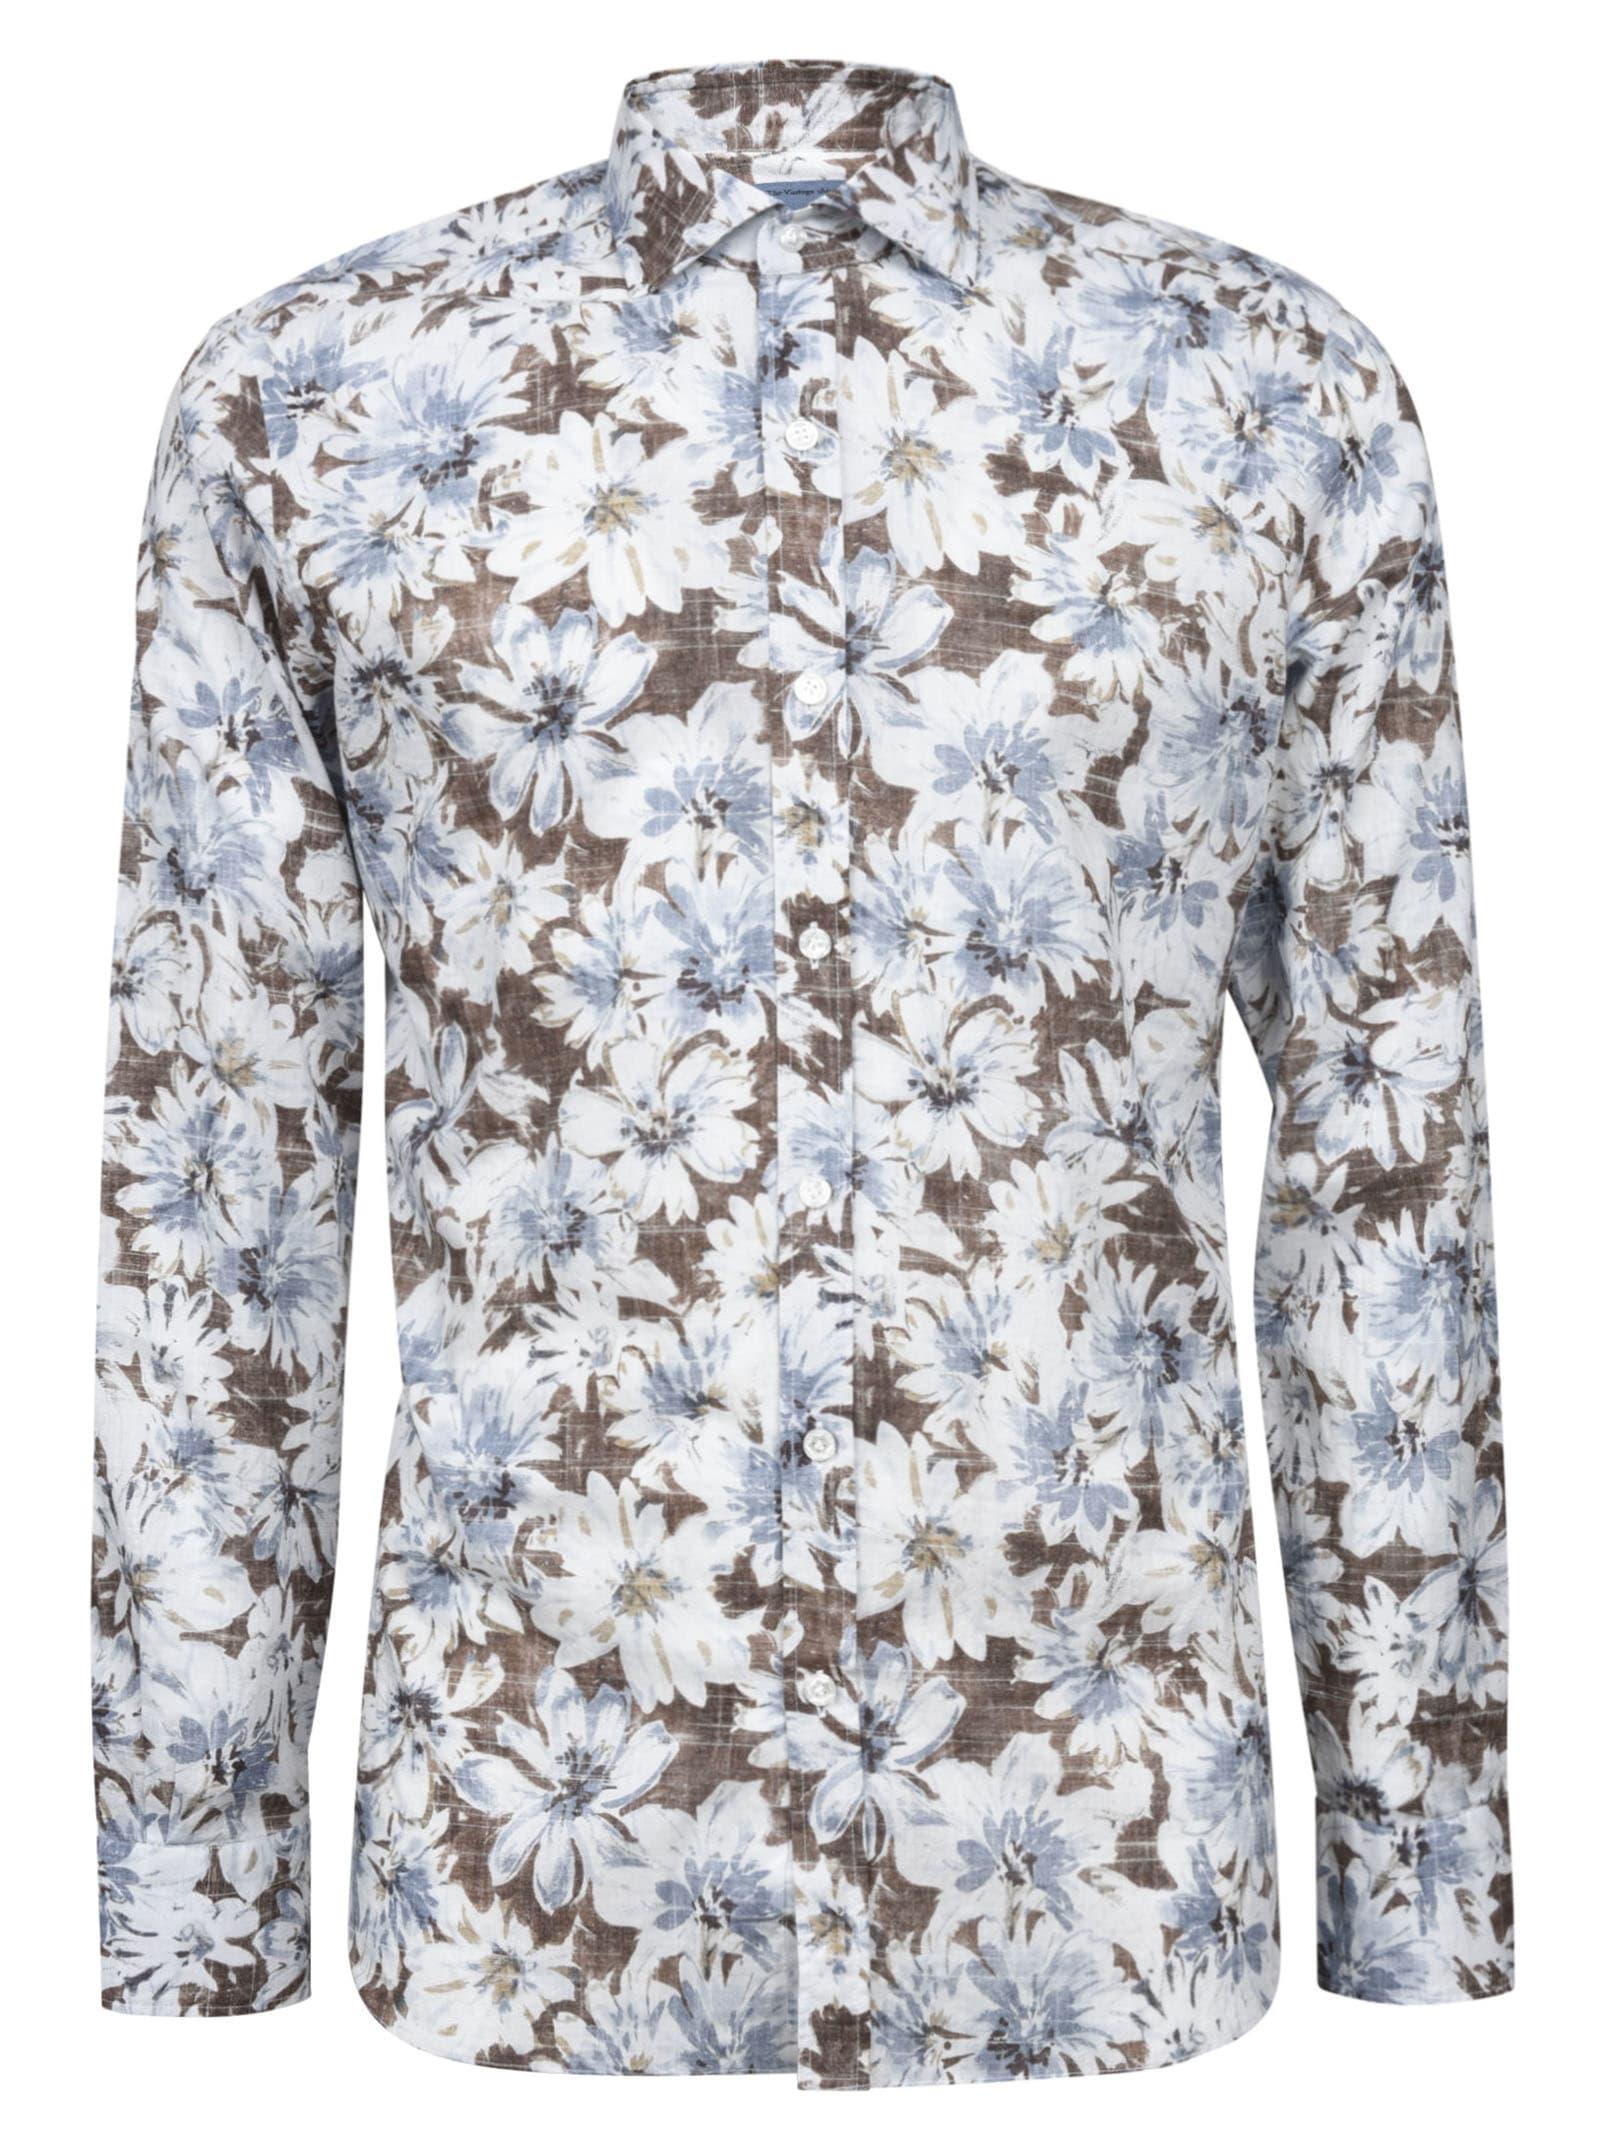 Dandylife Fiore Shirt